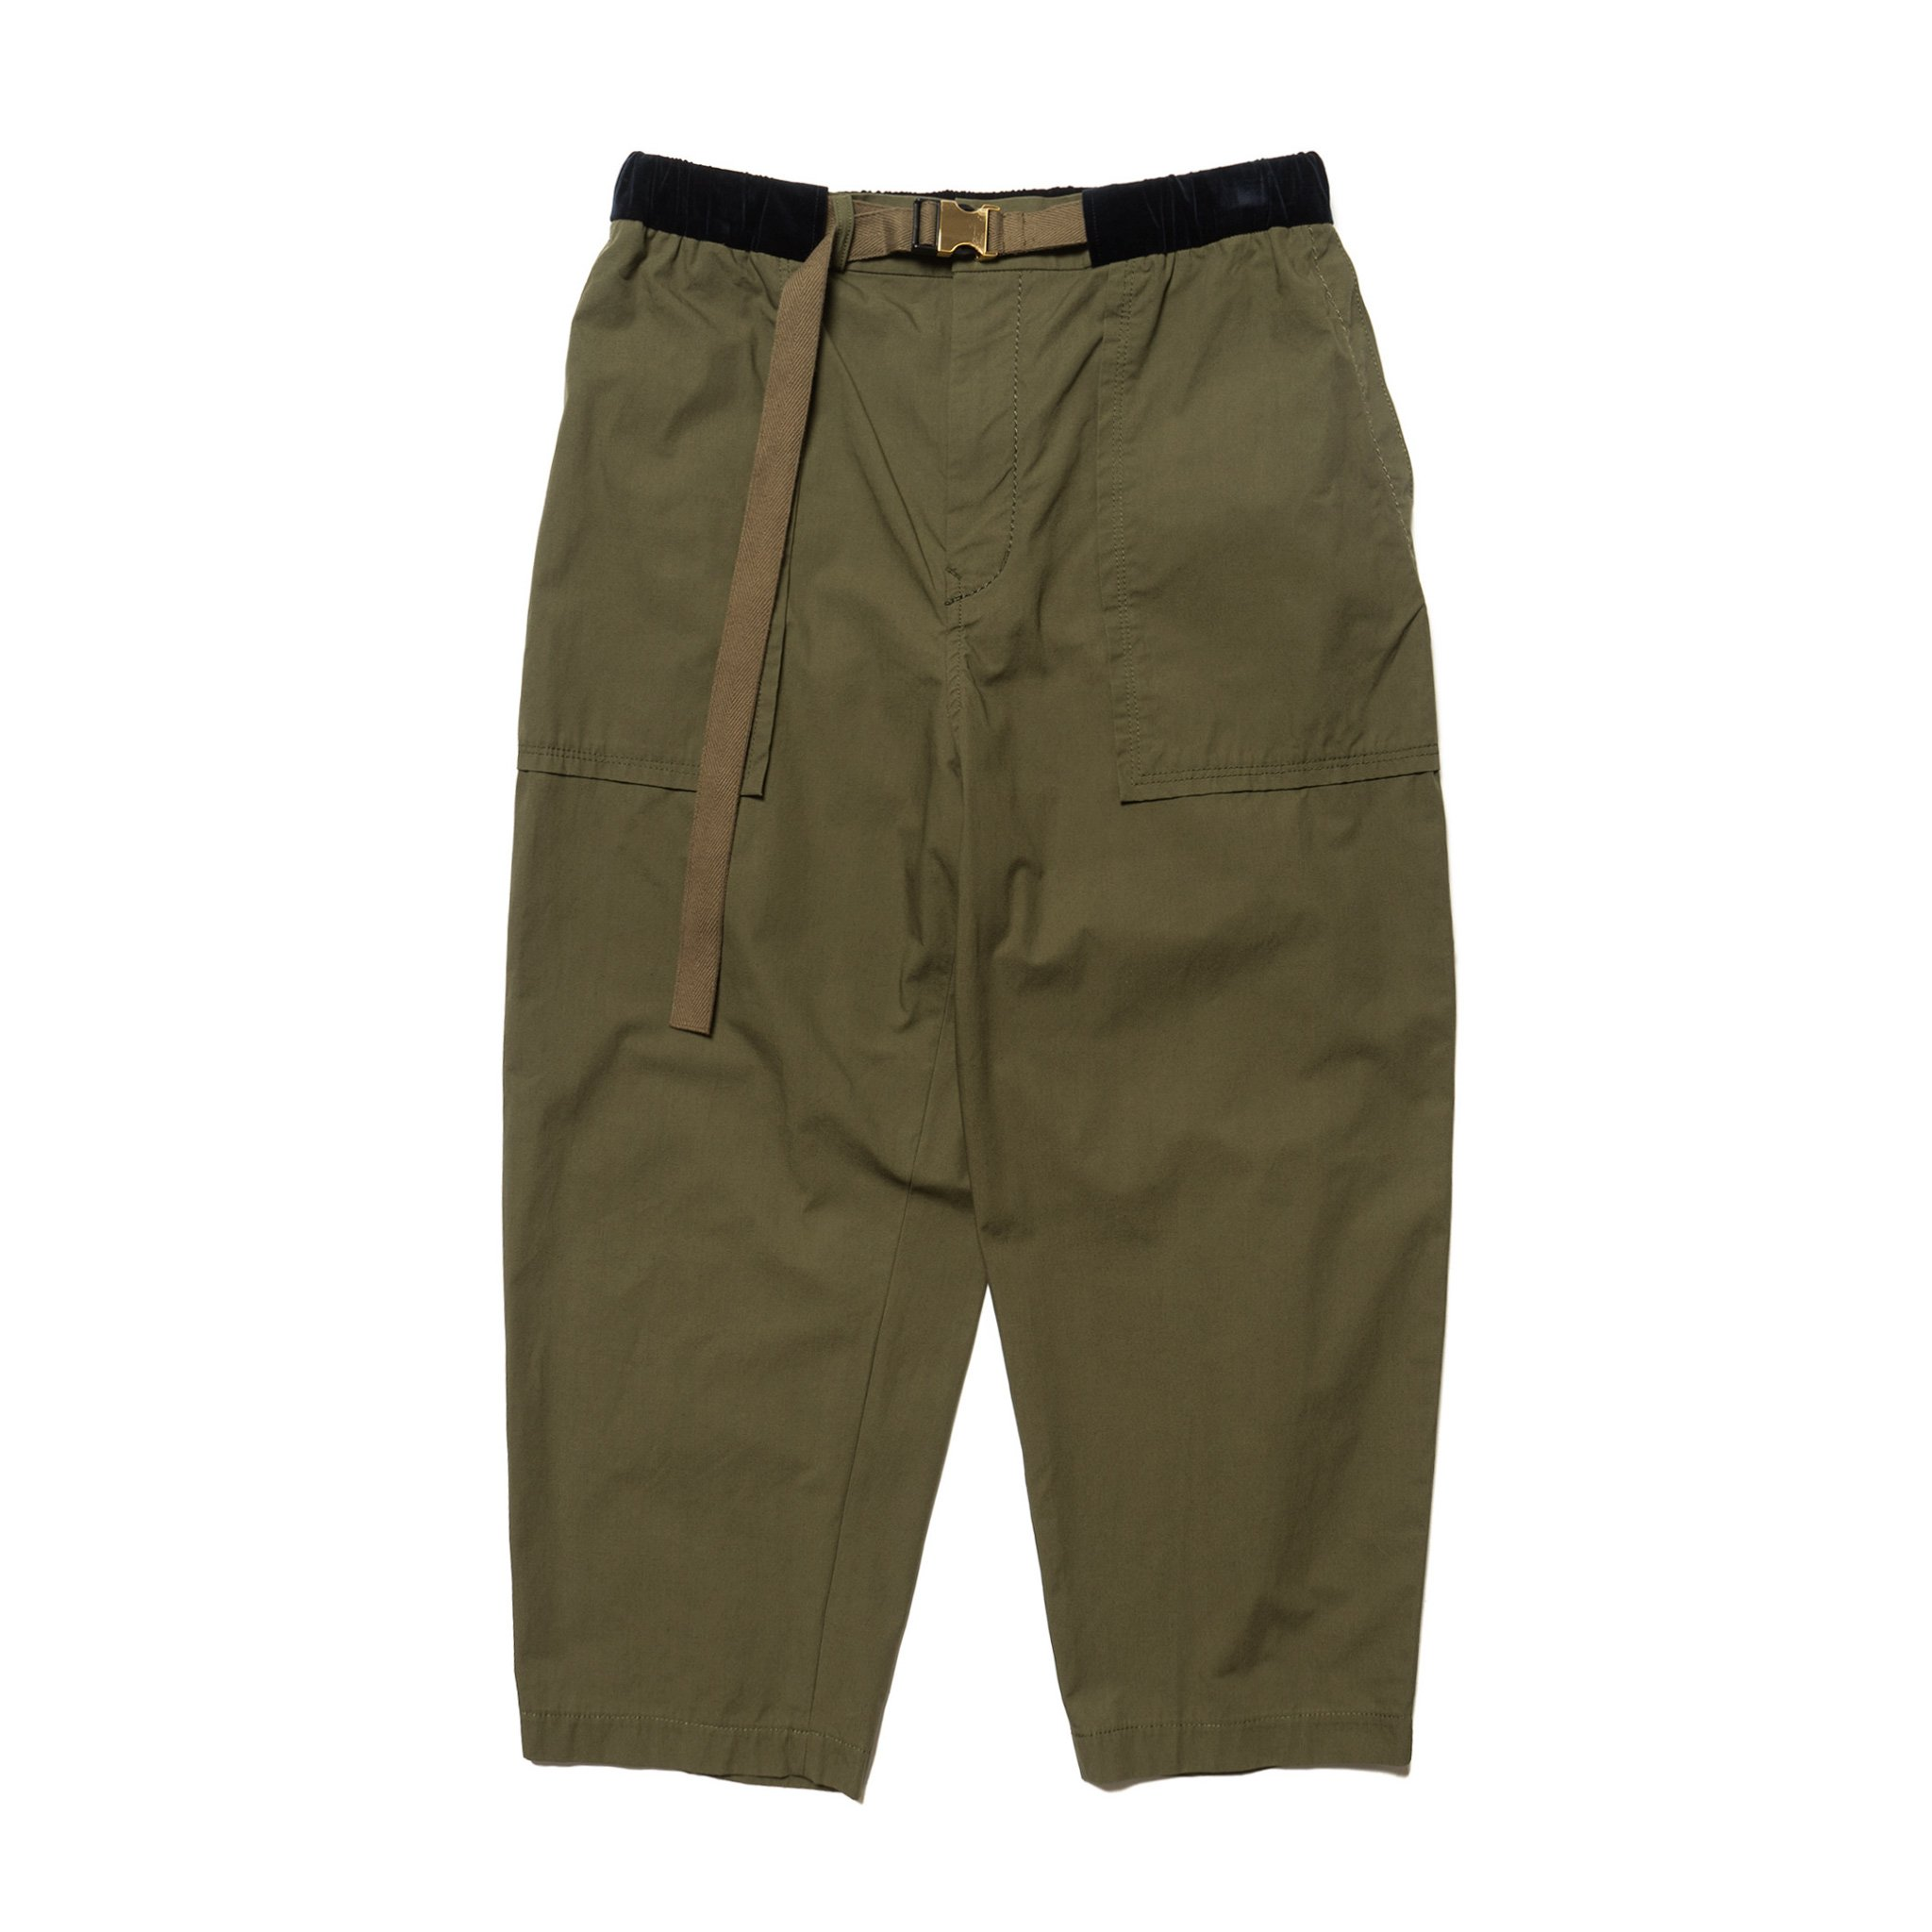 HAVEN-Sacai-Cotton-Nylon-Oxford-Pants-KHAKI-1_2048x2048.progressive.jpg